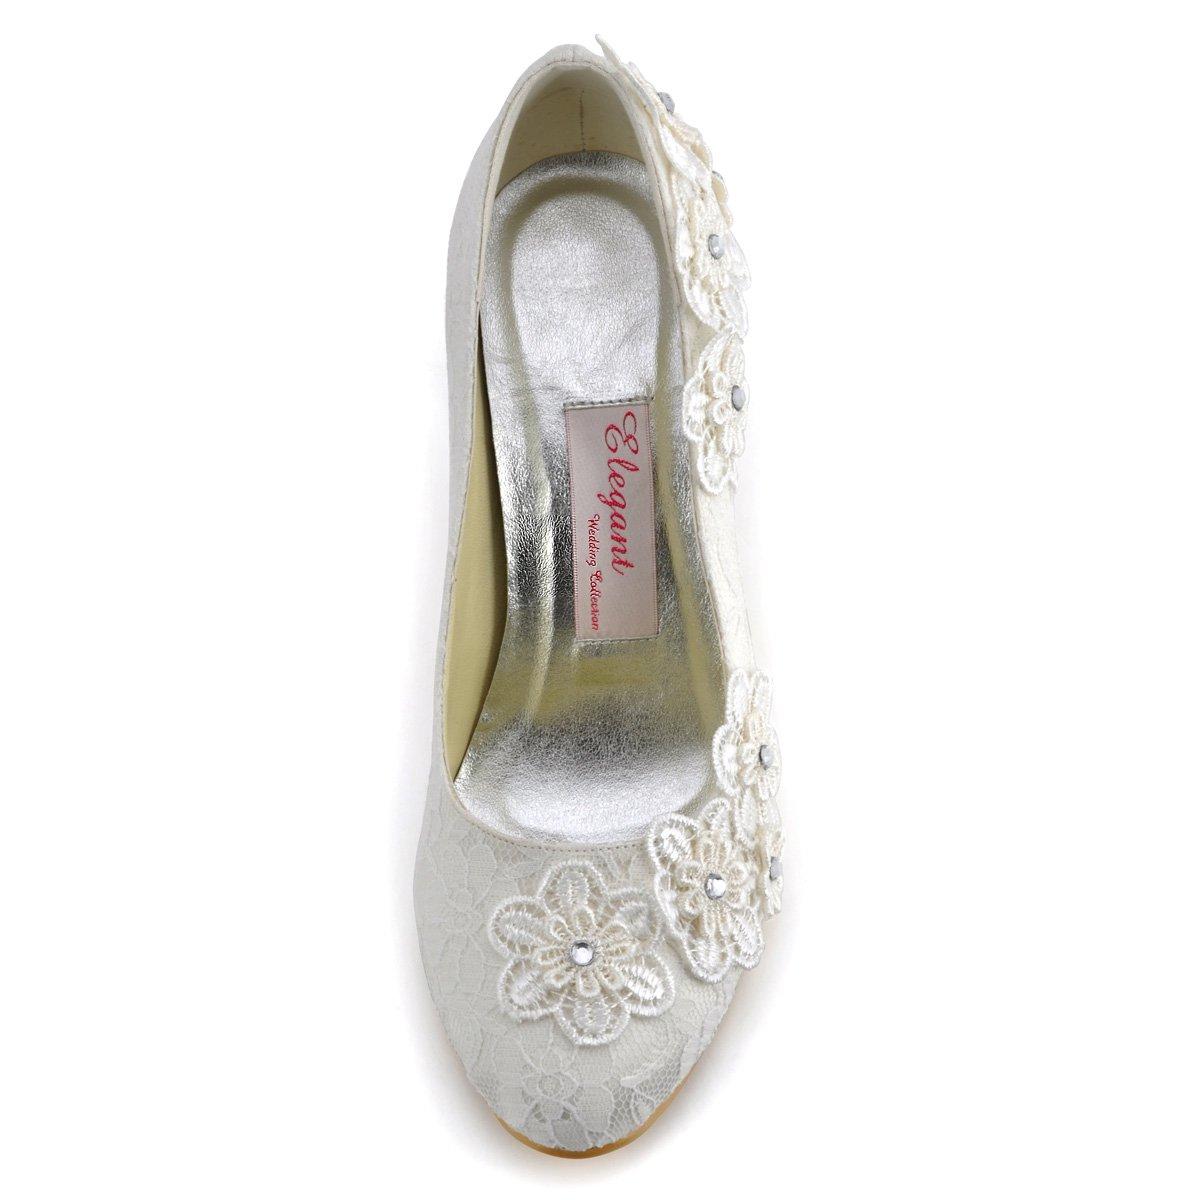 ElegantPark Women Vintage Closed Toe Pumps High Heel Flowers Lace Wedding Bridal Dress Shoes 5